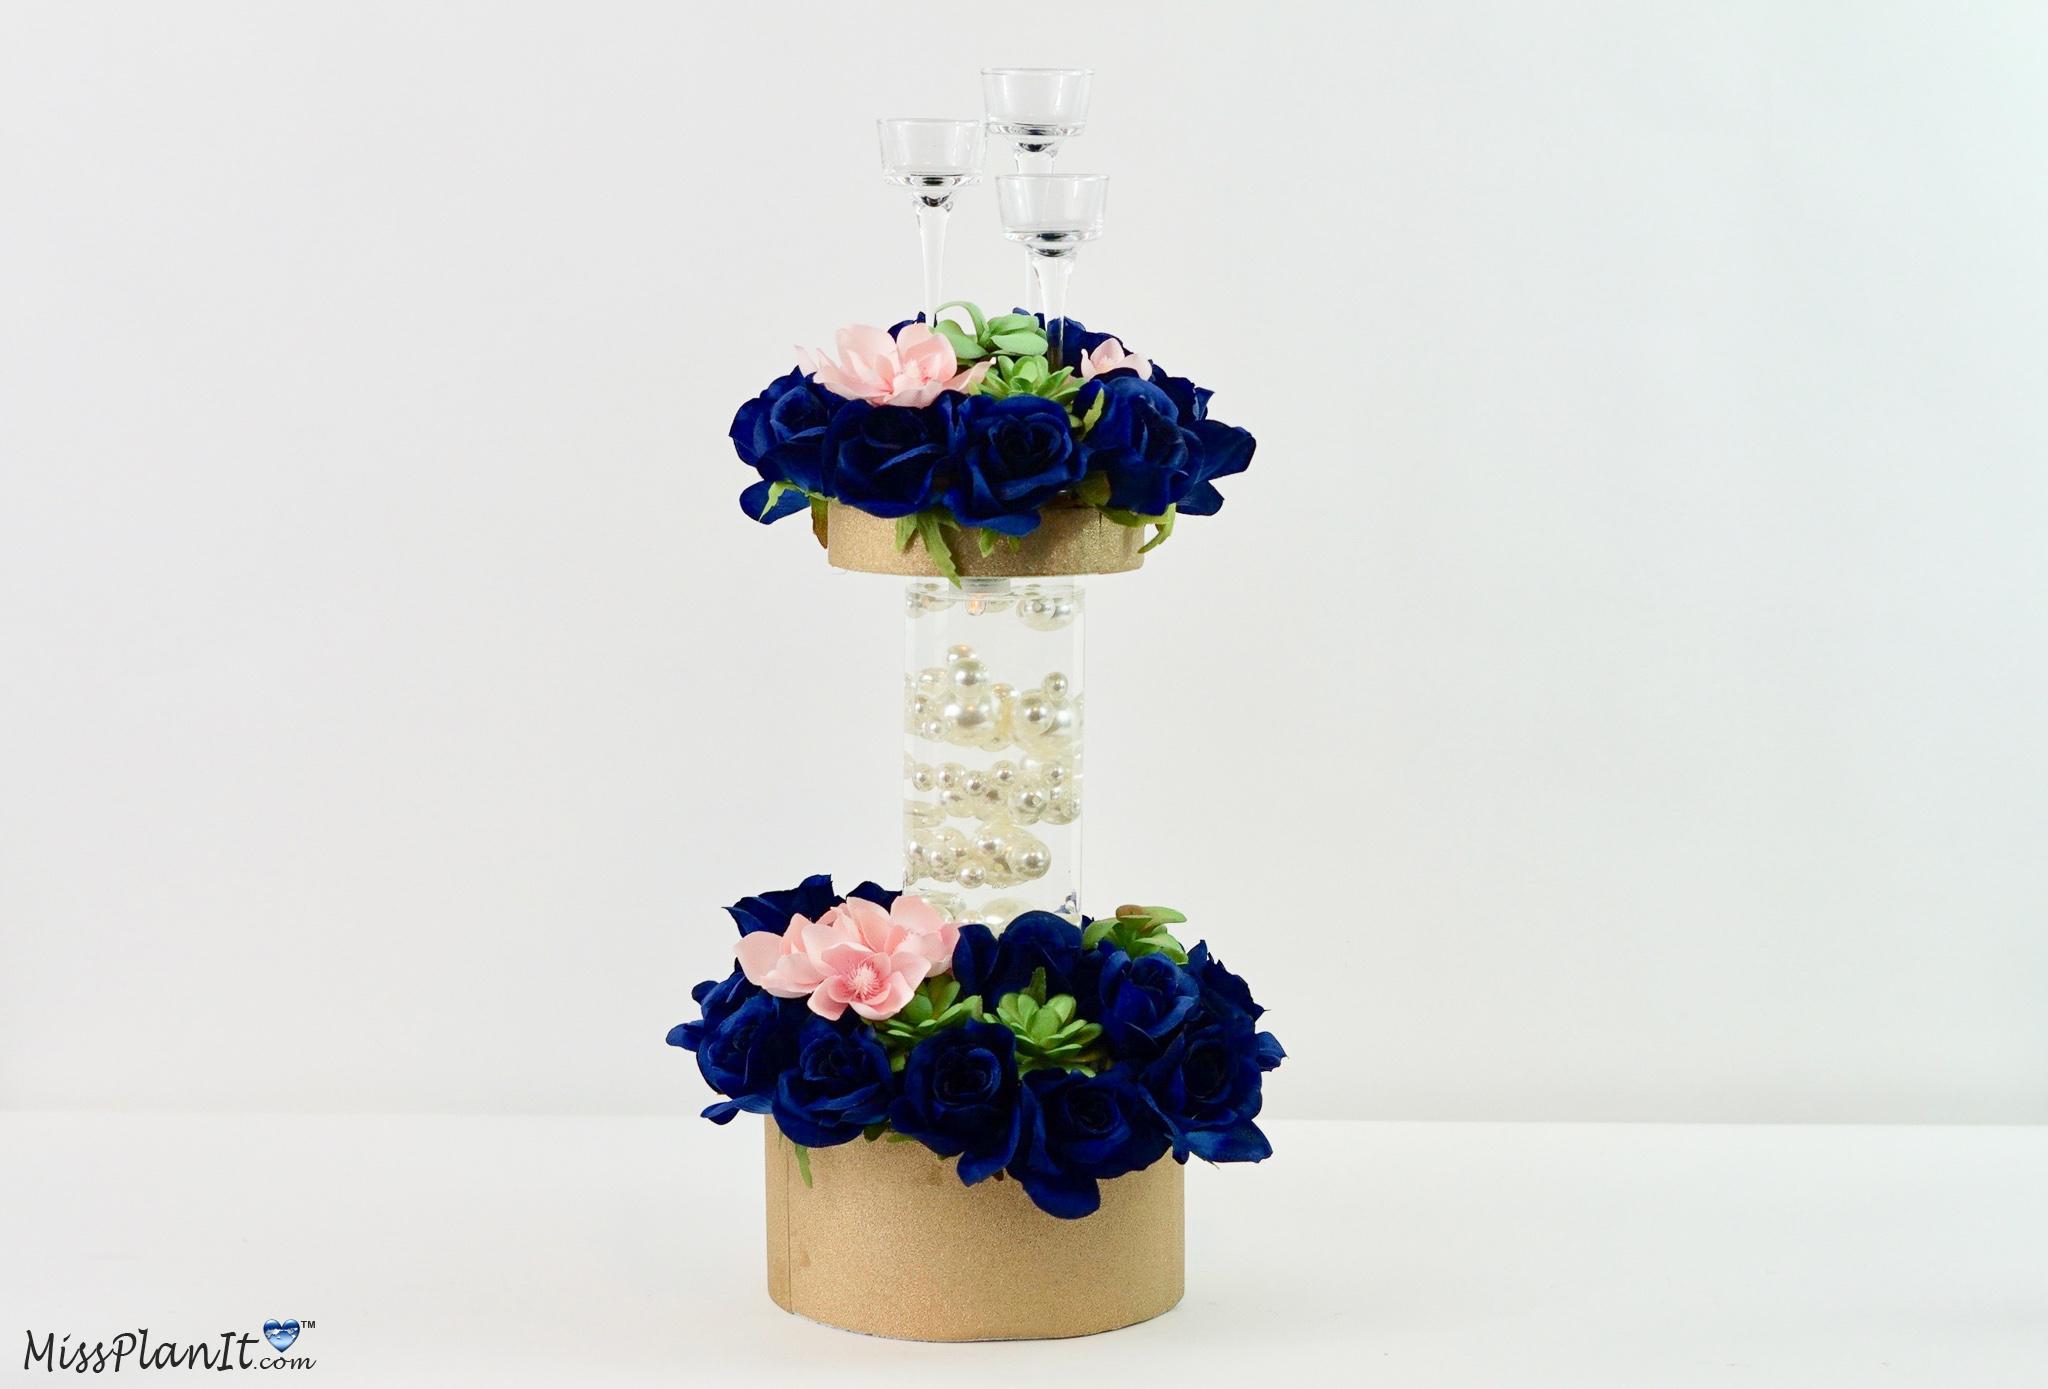 DIY Amazing Nerdy Chic Unique Wedding Centerpieces